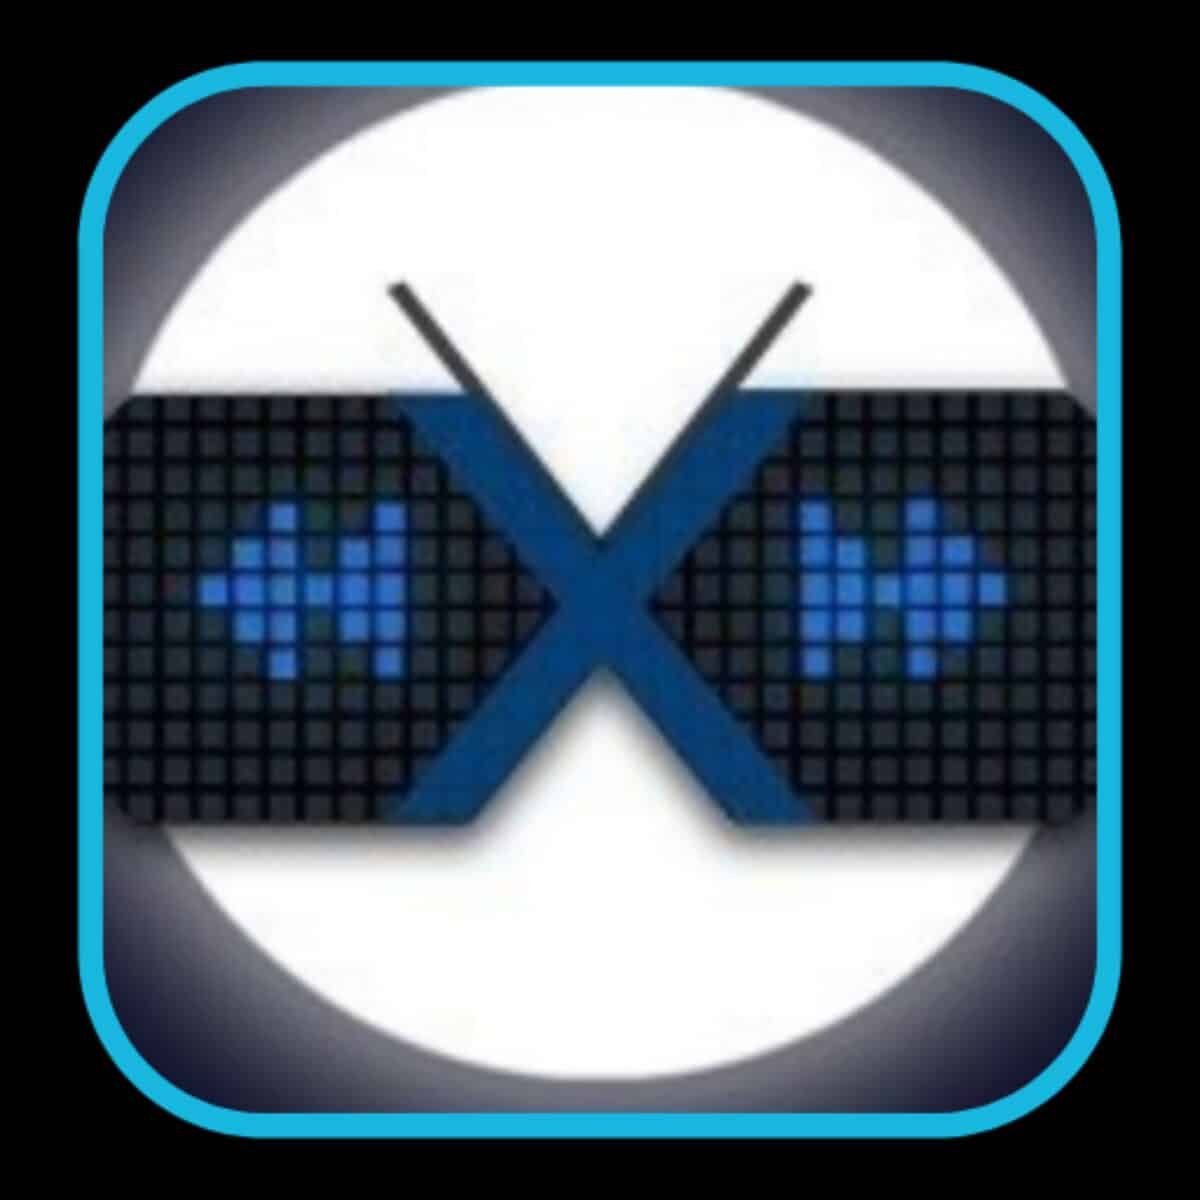 Download-X8-Speeder-APK-Versi-China